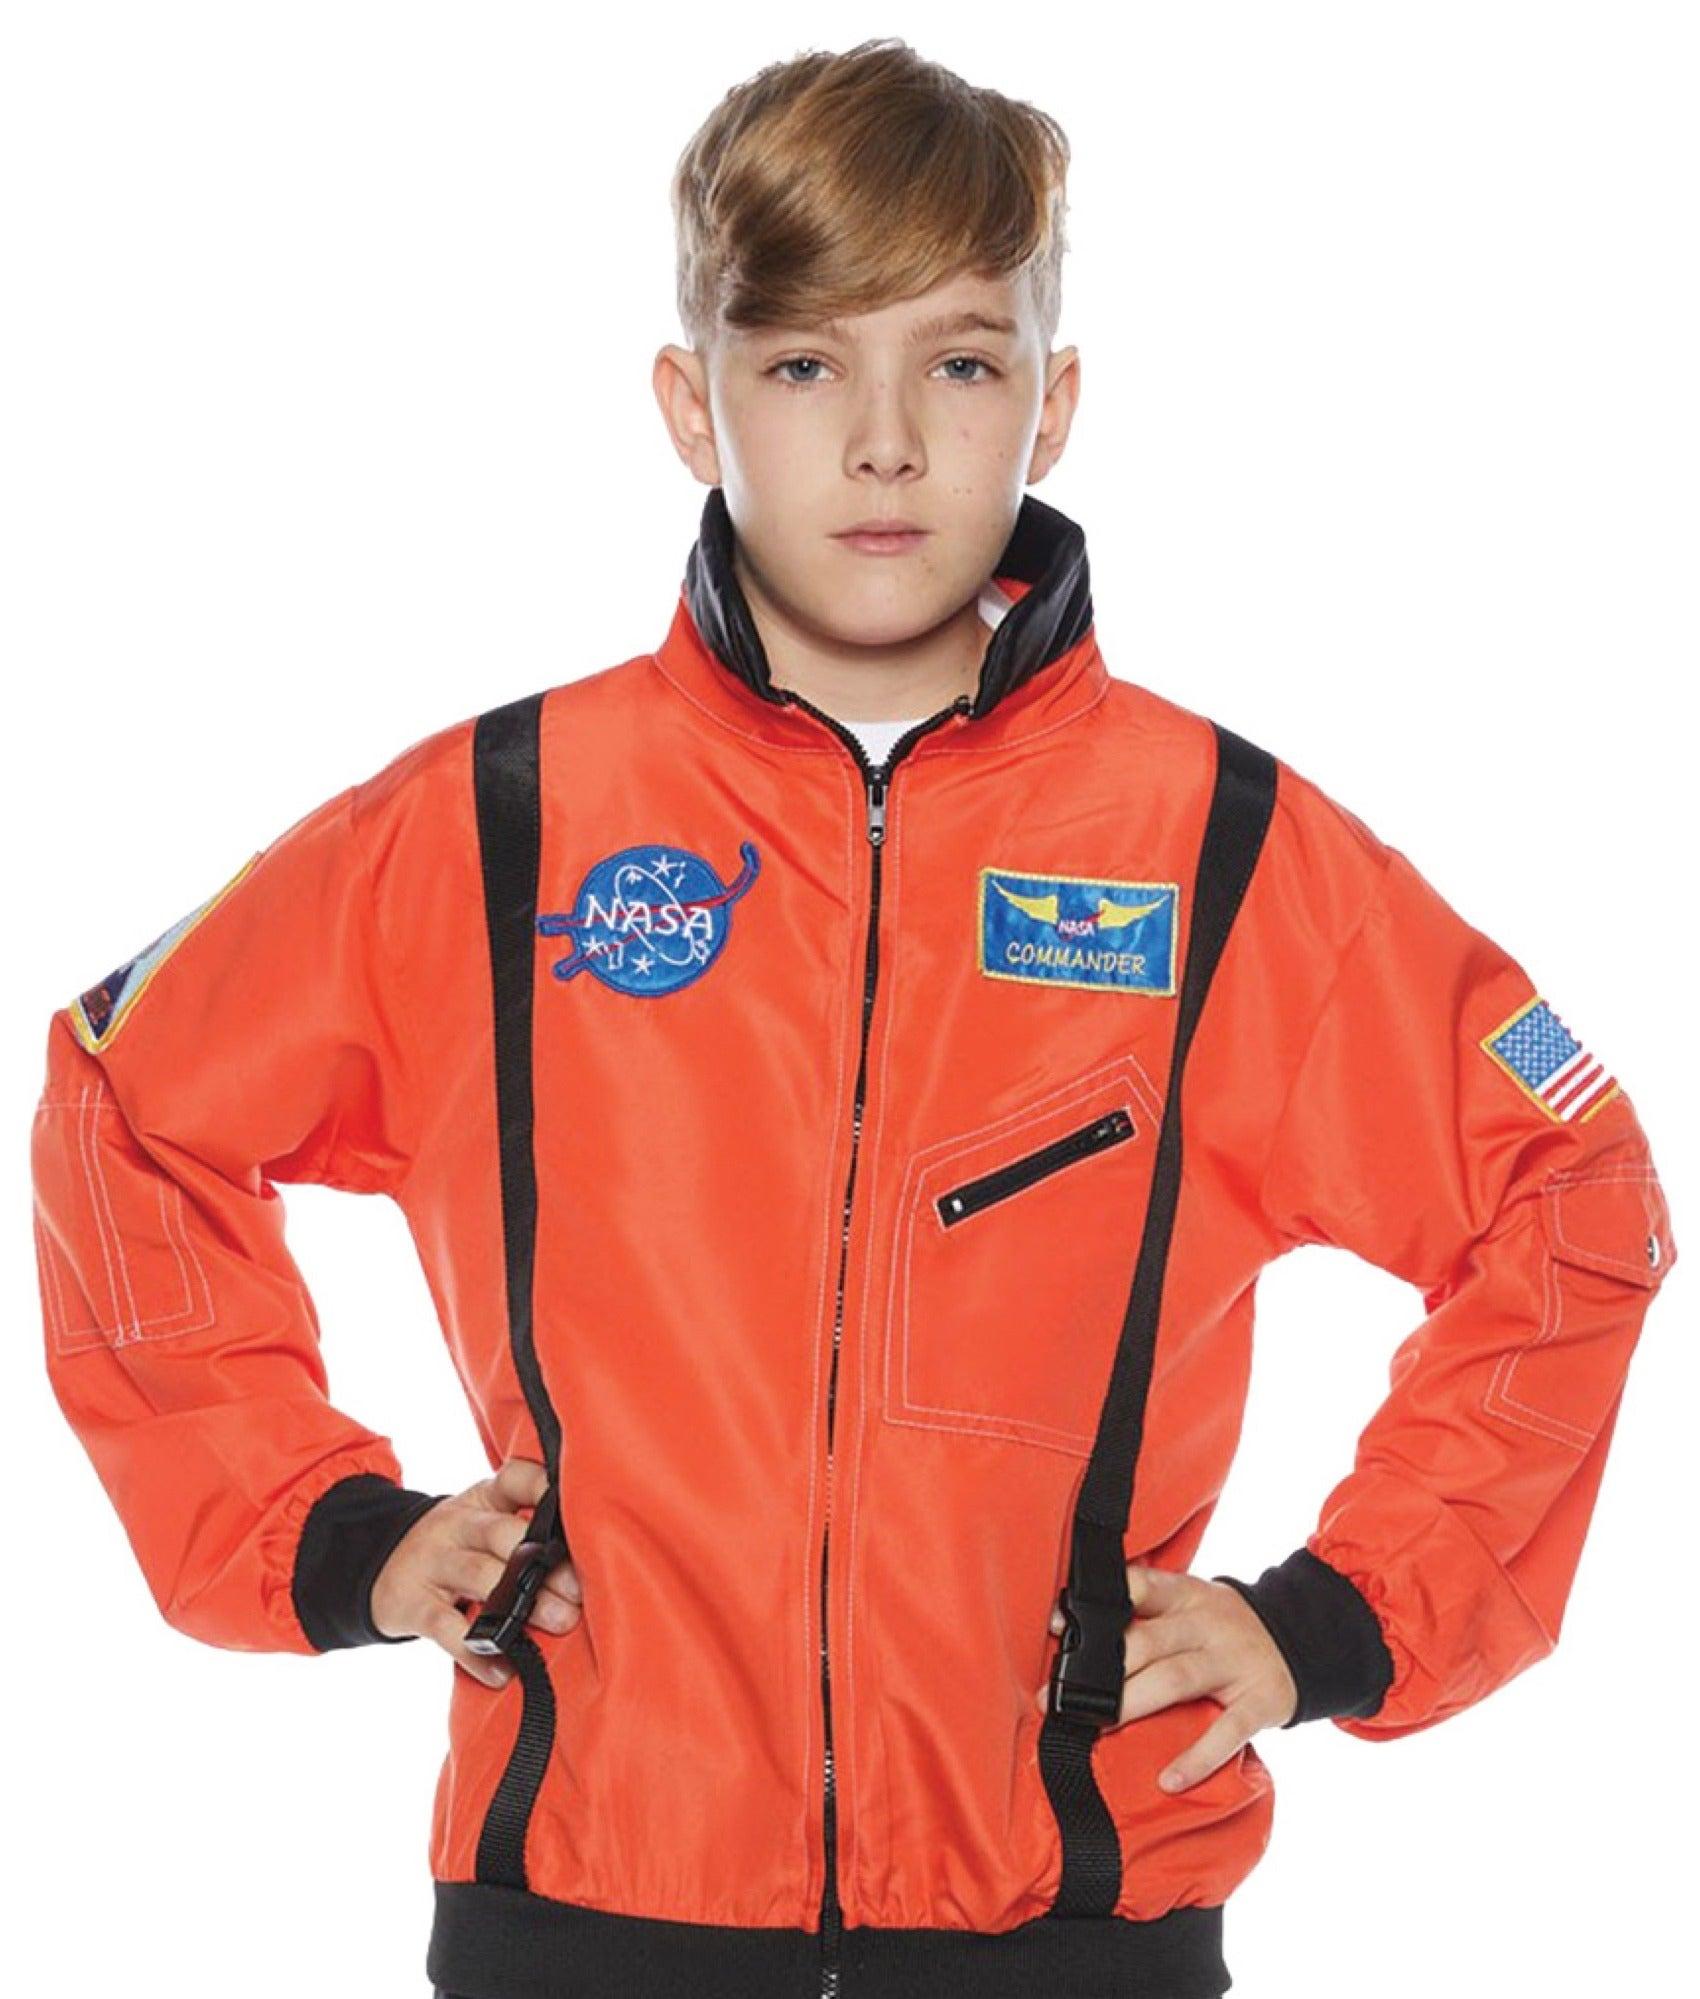 Hobbypos Astronaut NASA Spaceman Space Orange Uniform Book Week Boys Costume Jacket